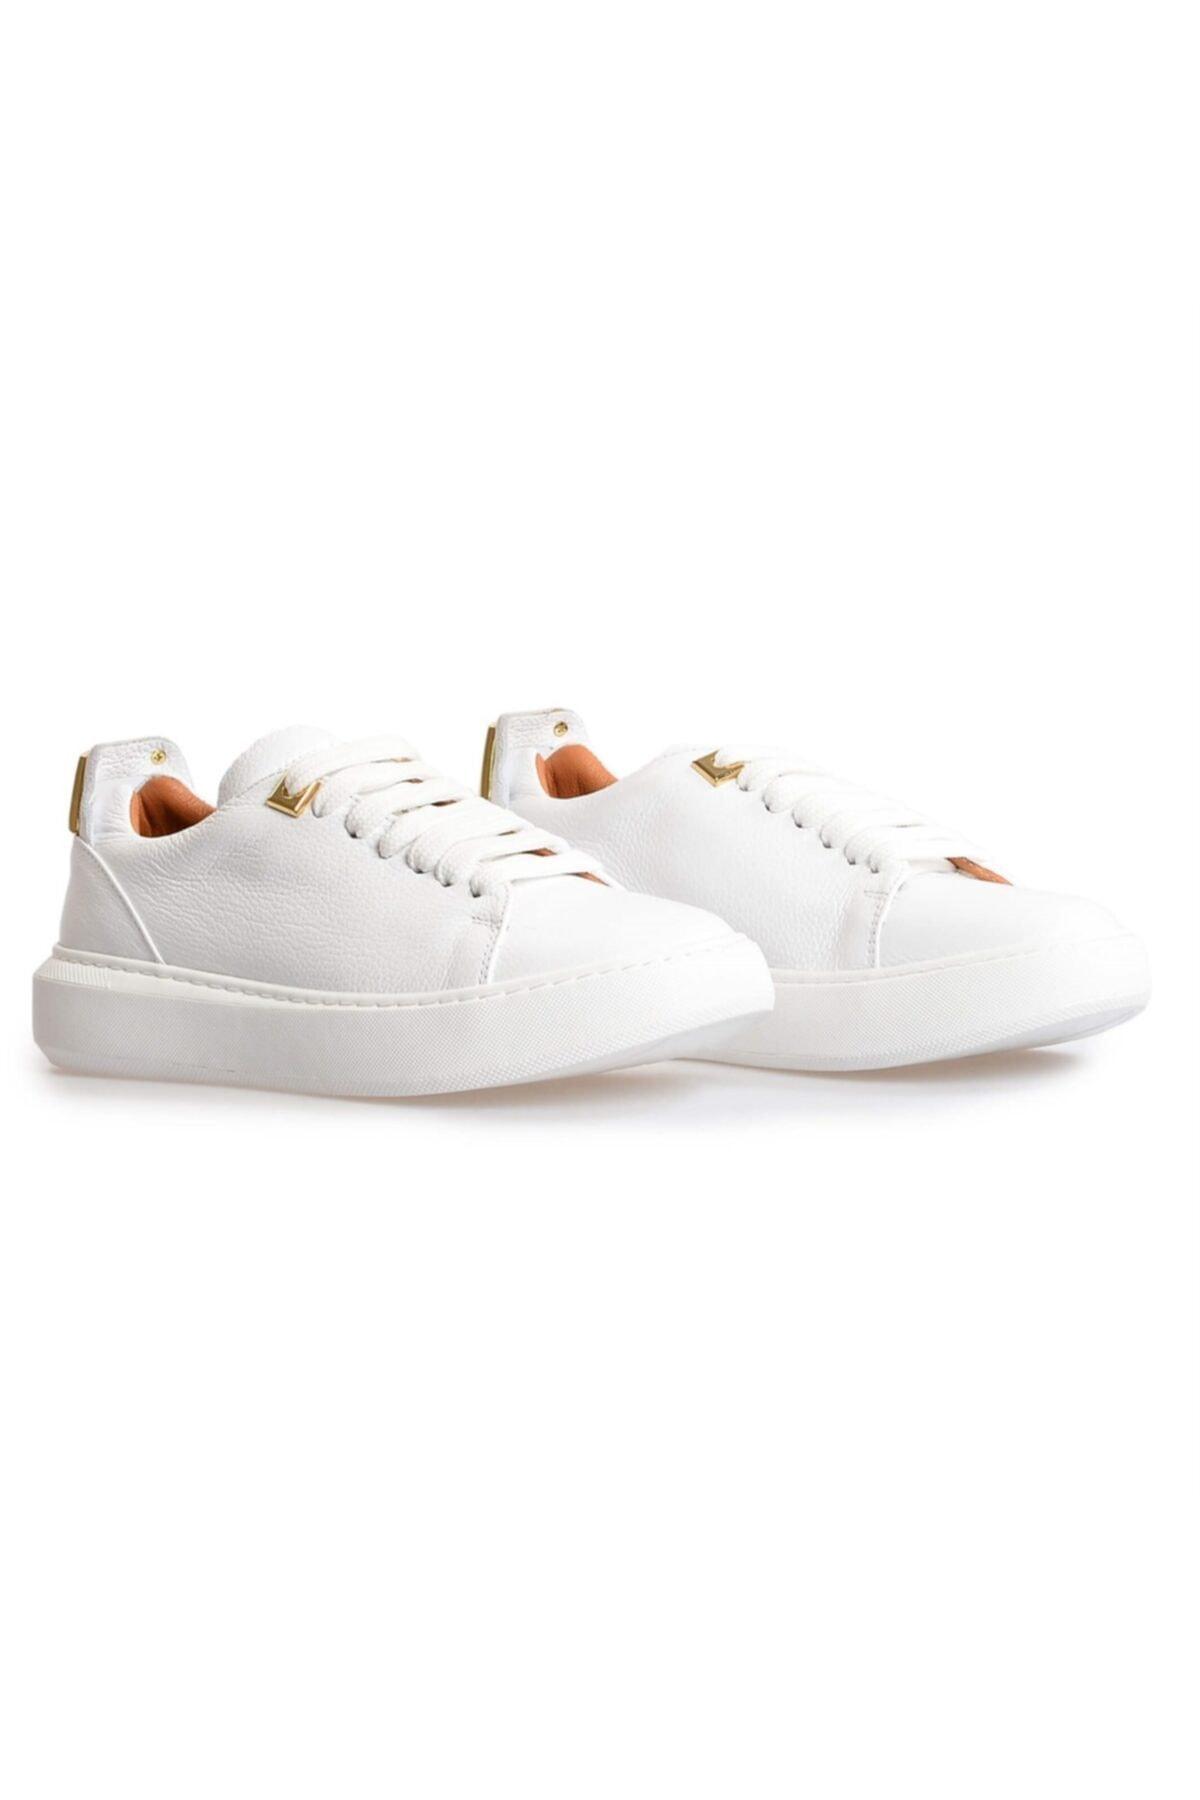 Flower Beyaz Deri Gold Toka Detaylı Sneakers 2